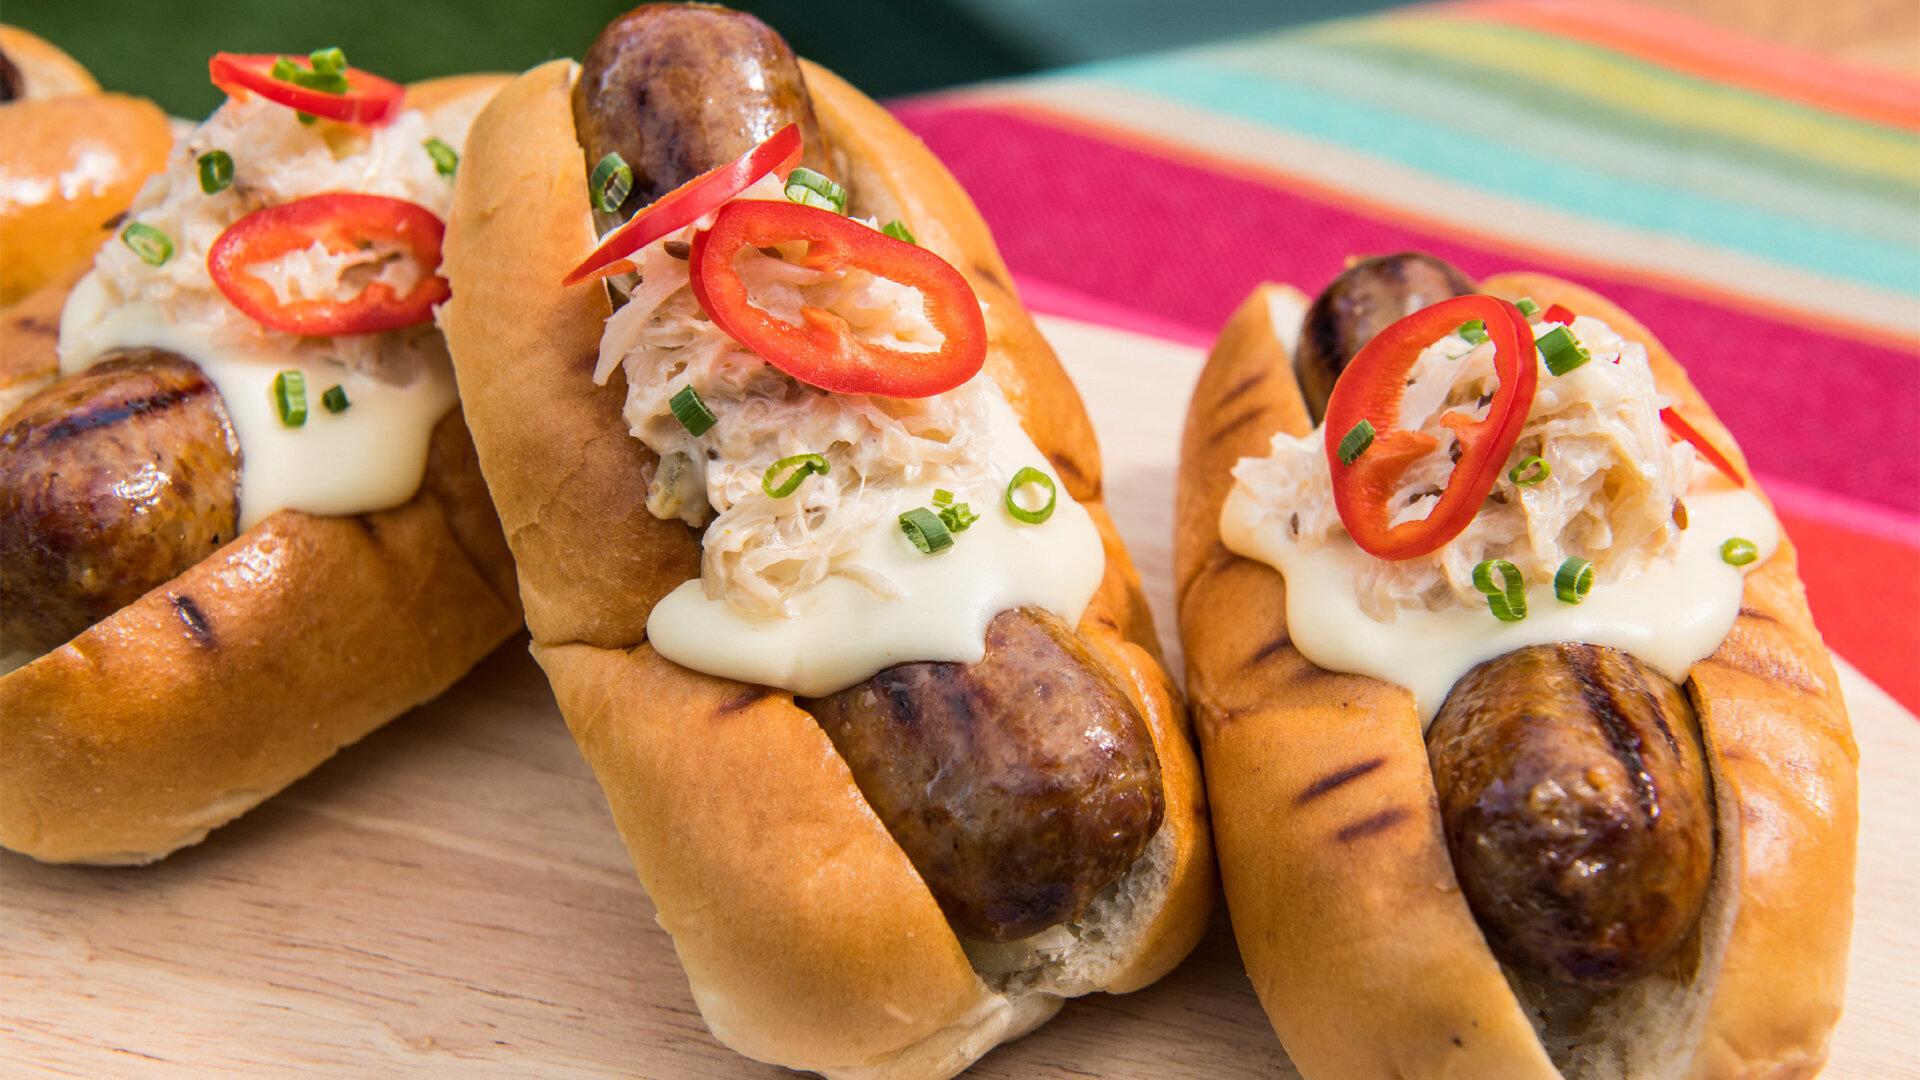 The Kitchen — s28e10 — Hot Dogs, New Tricks